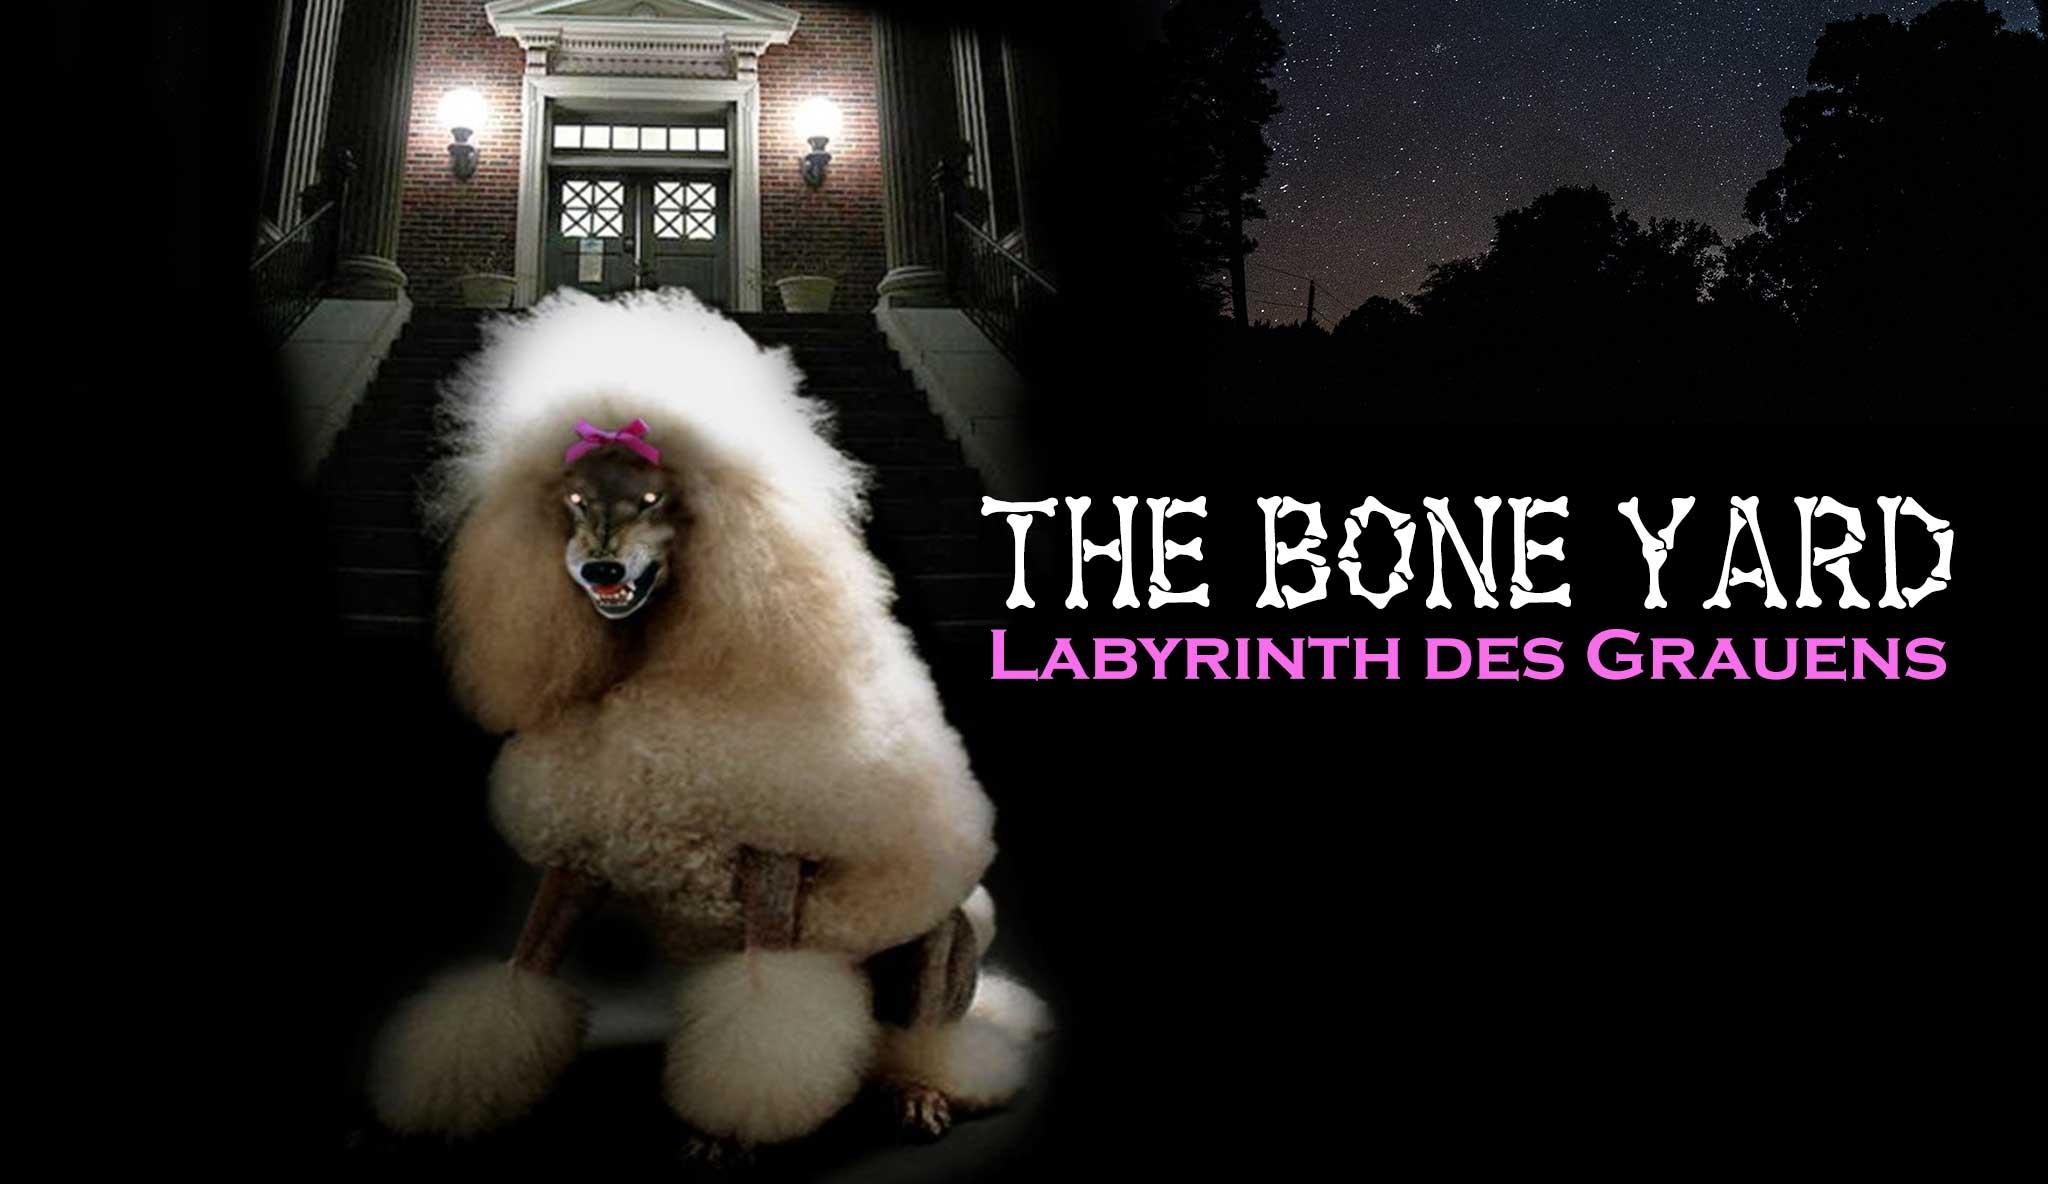 the-bone-yard-labyrinth-des-grauens\header.jpg